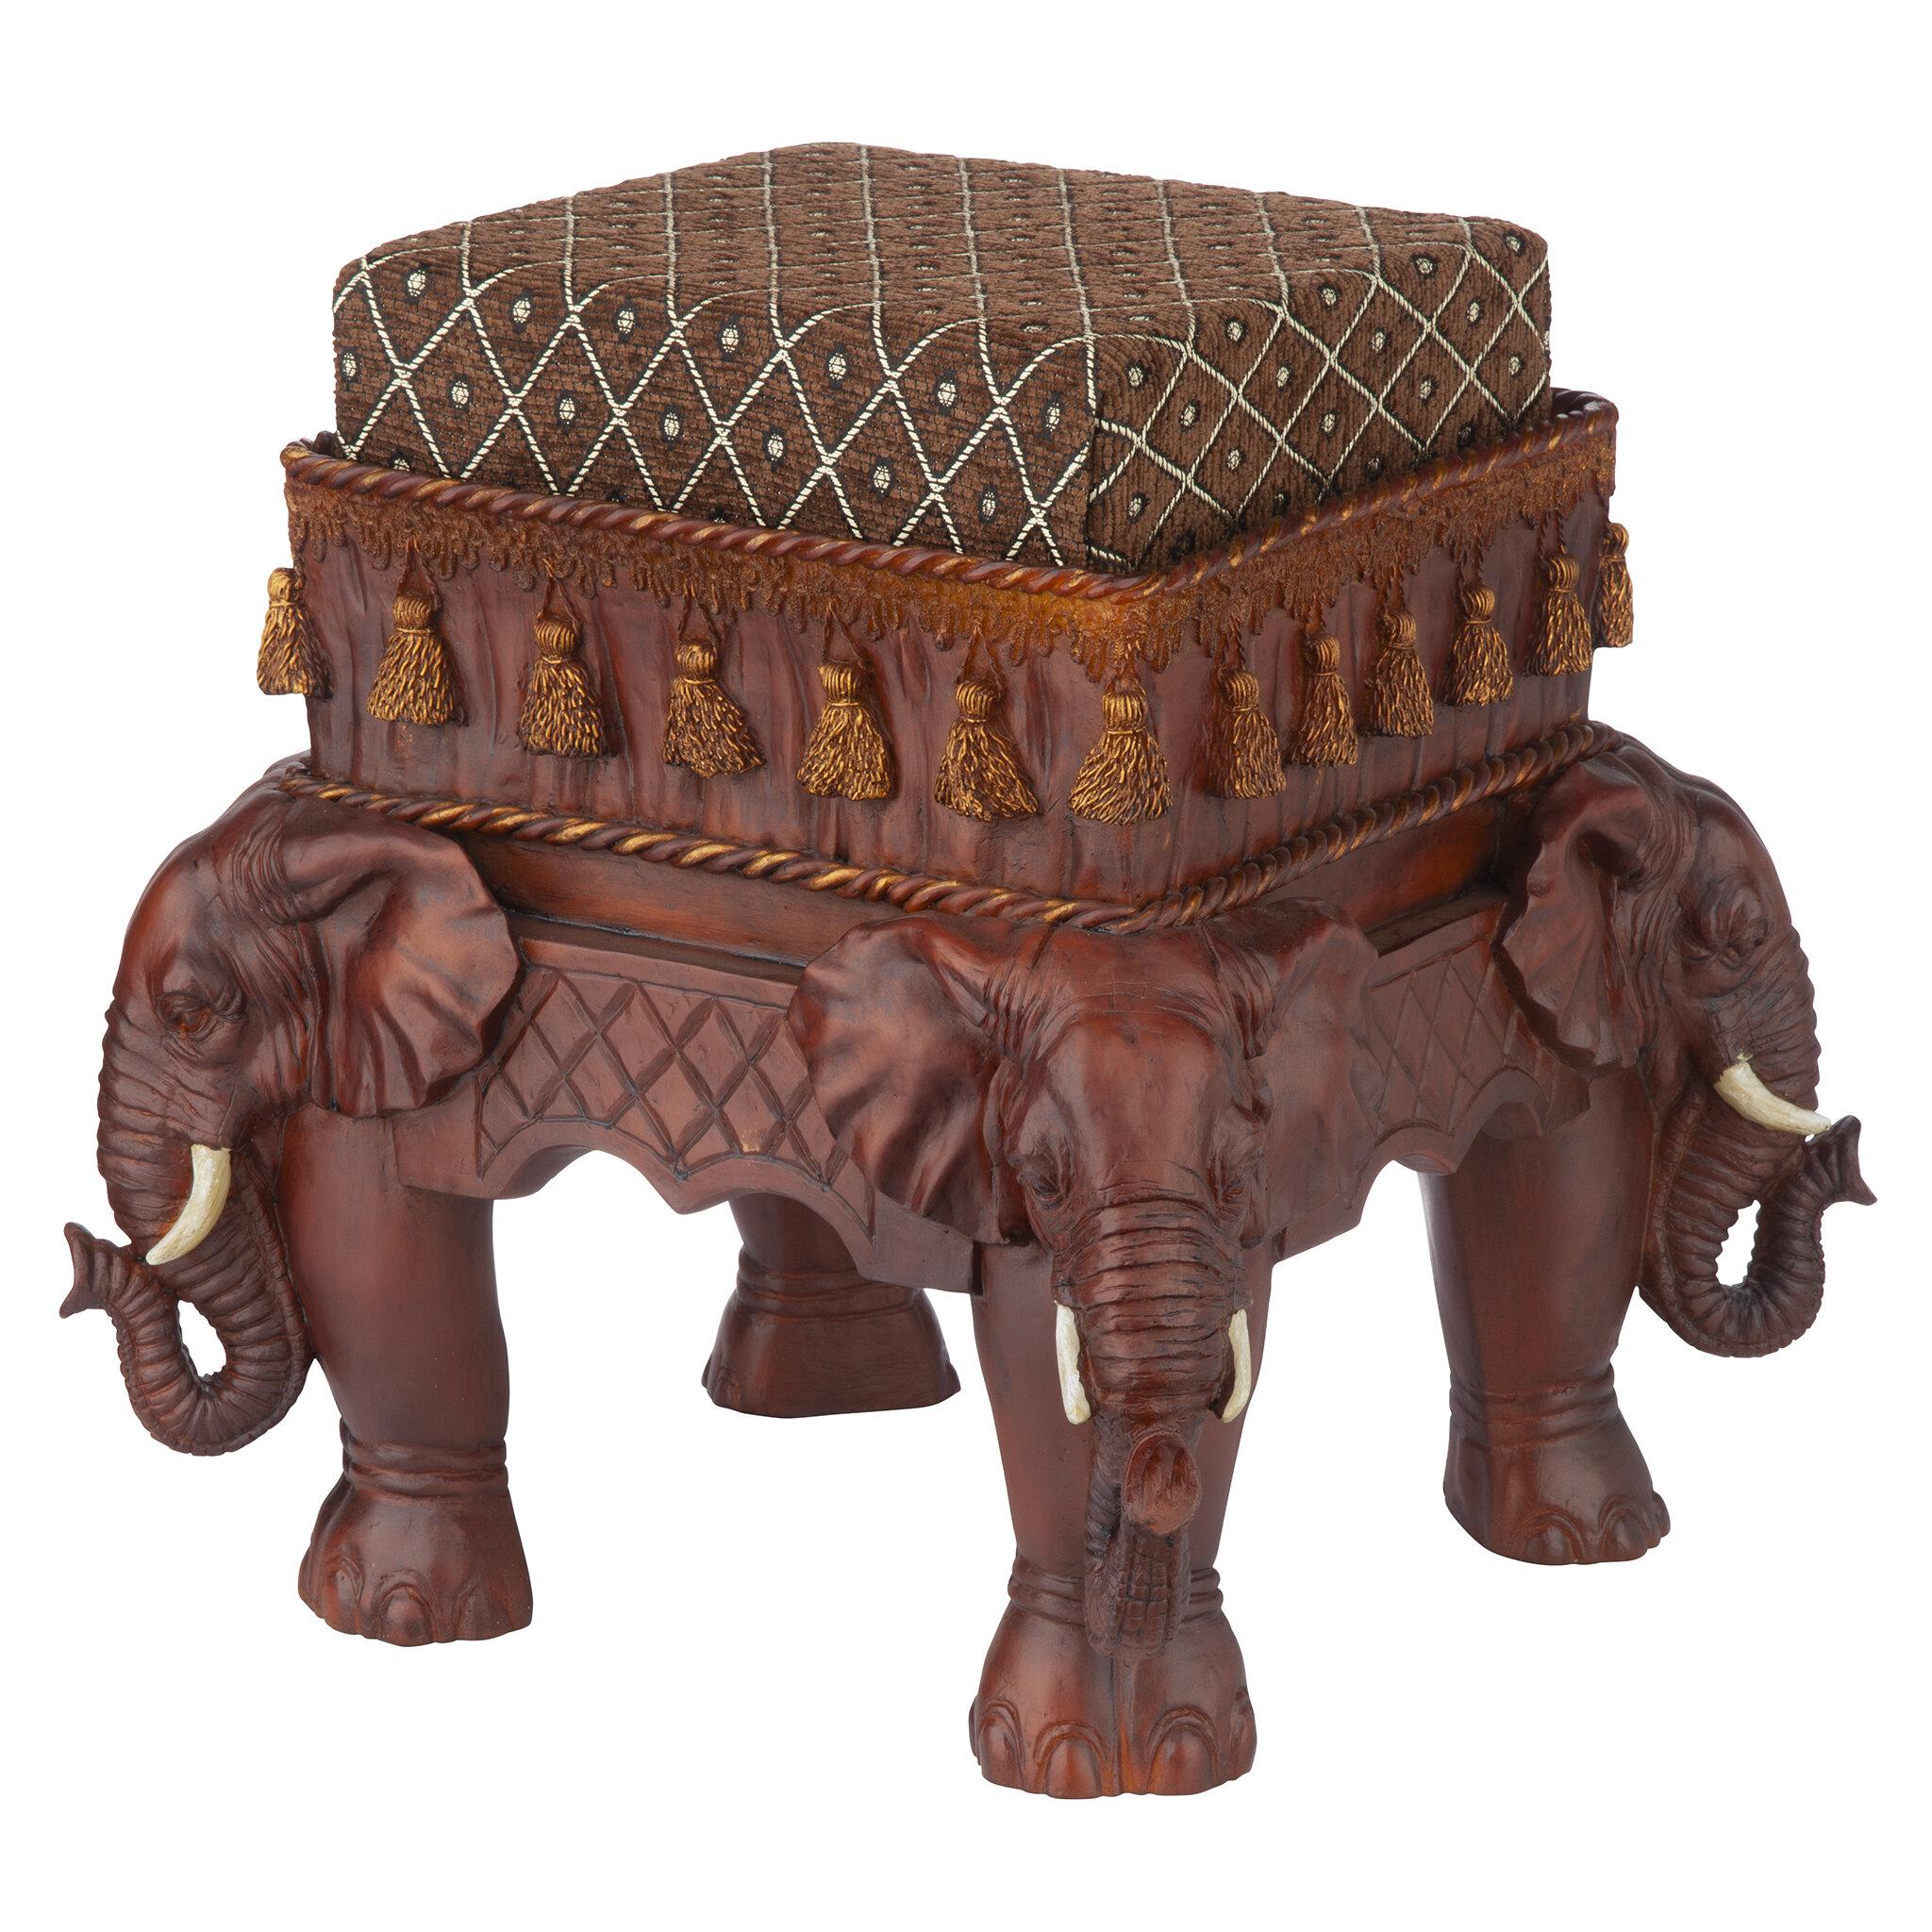 659c23d8f707 Design Toscano The Maharajah s Elephants Ottoman   Reviews